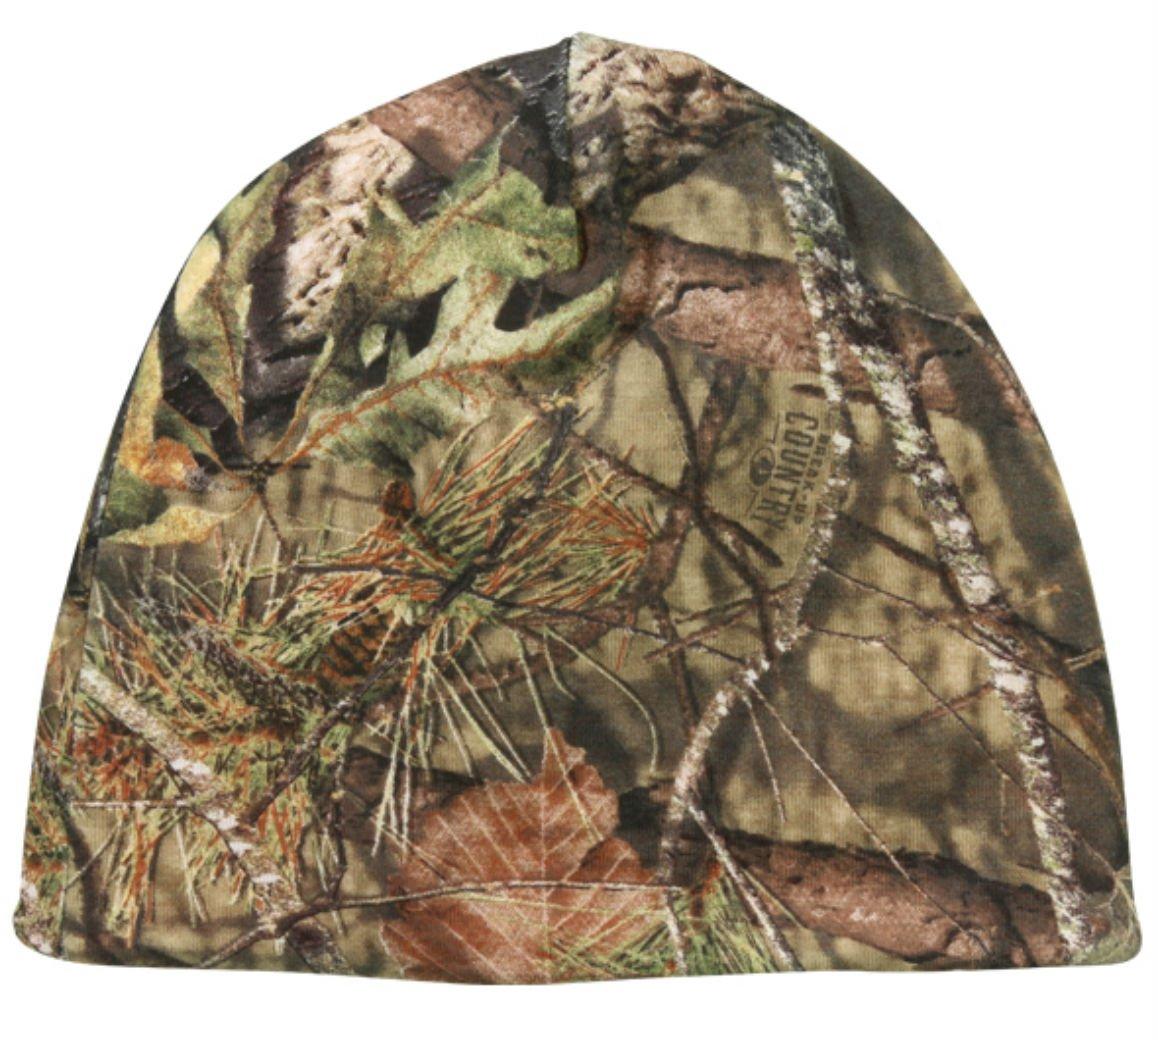 Amazon.com   Mossy Oak Country Reversible Blaze Orange   Camo Hunting Knit  Beanie   Sports   Outdoors 08aea35b93c8